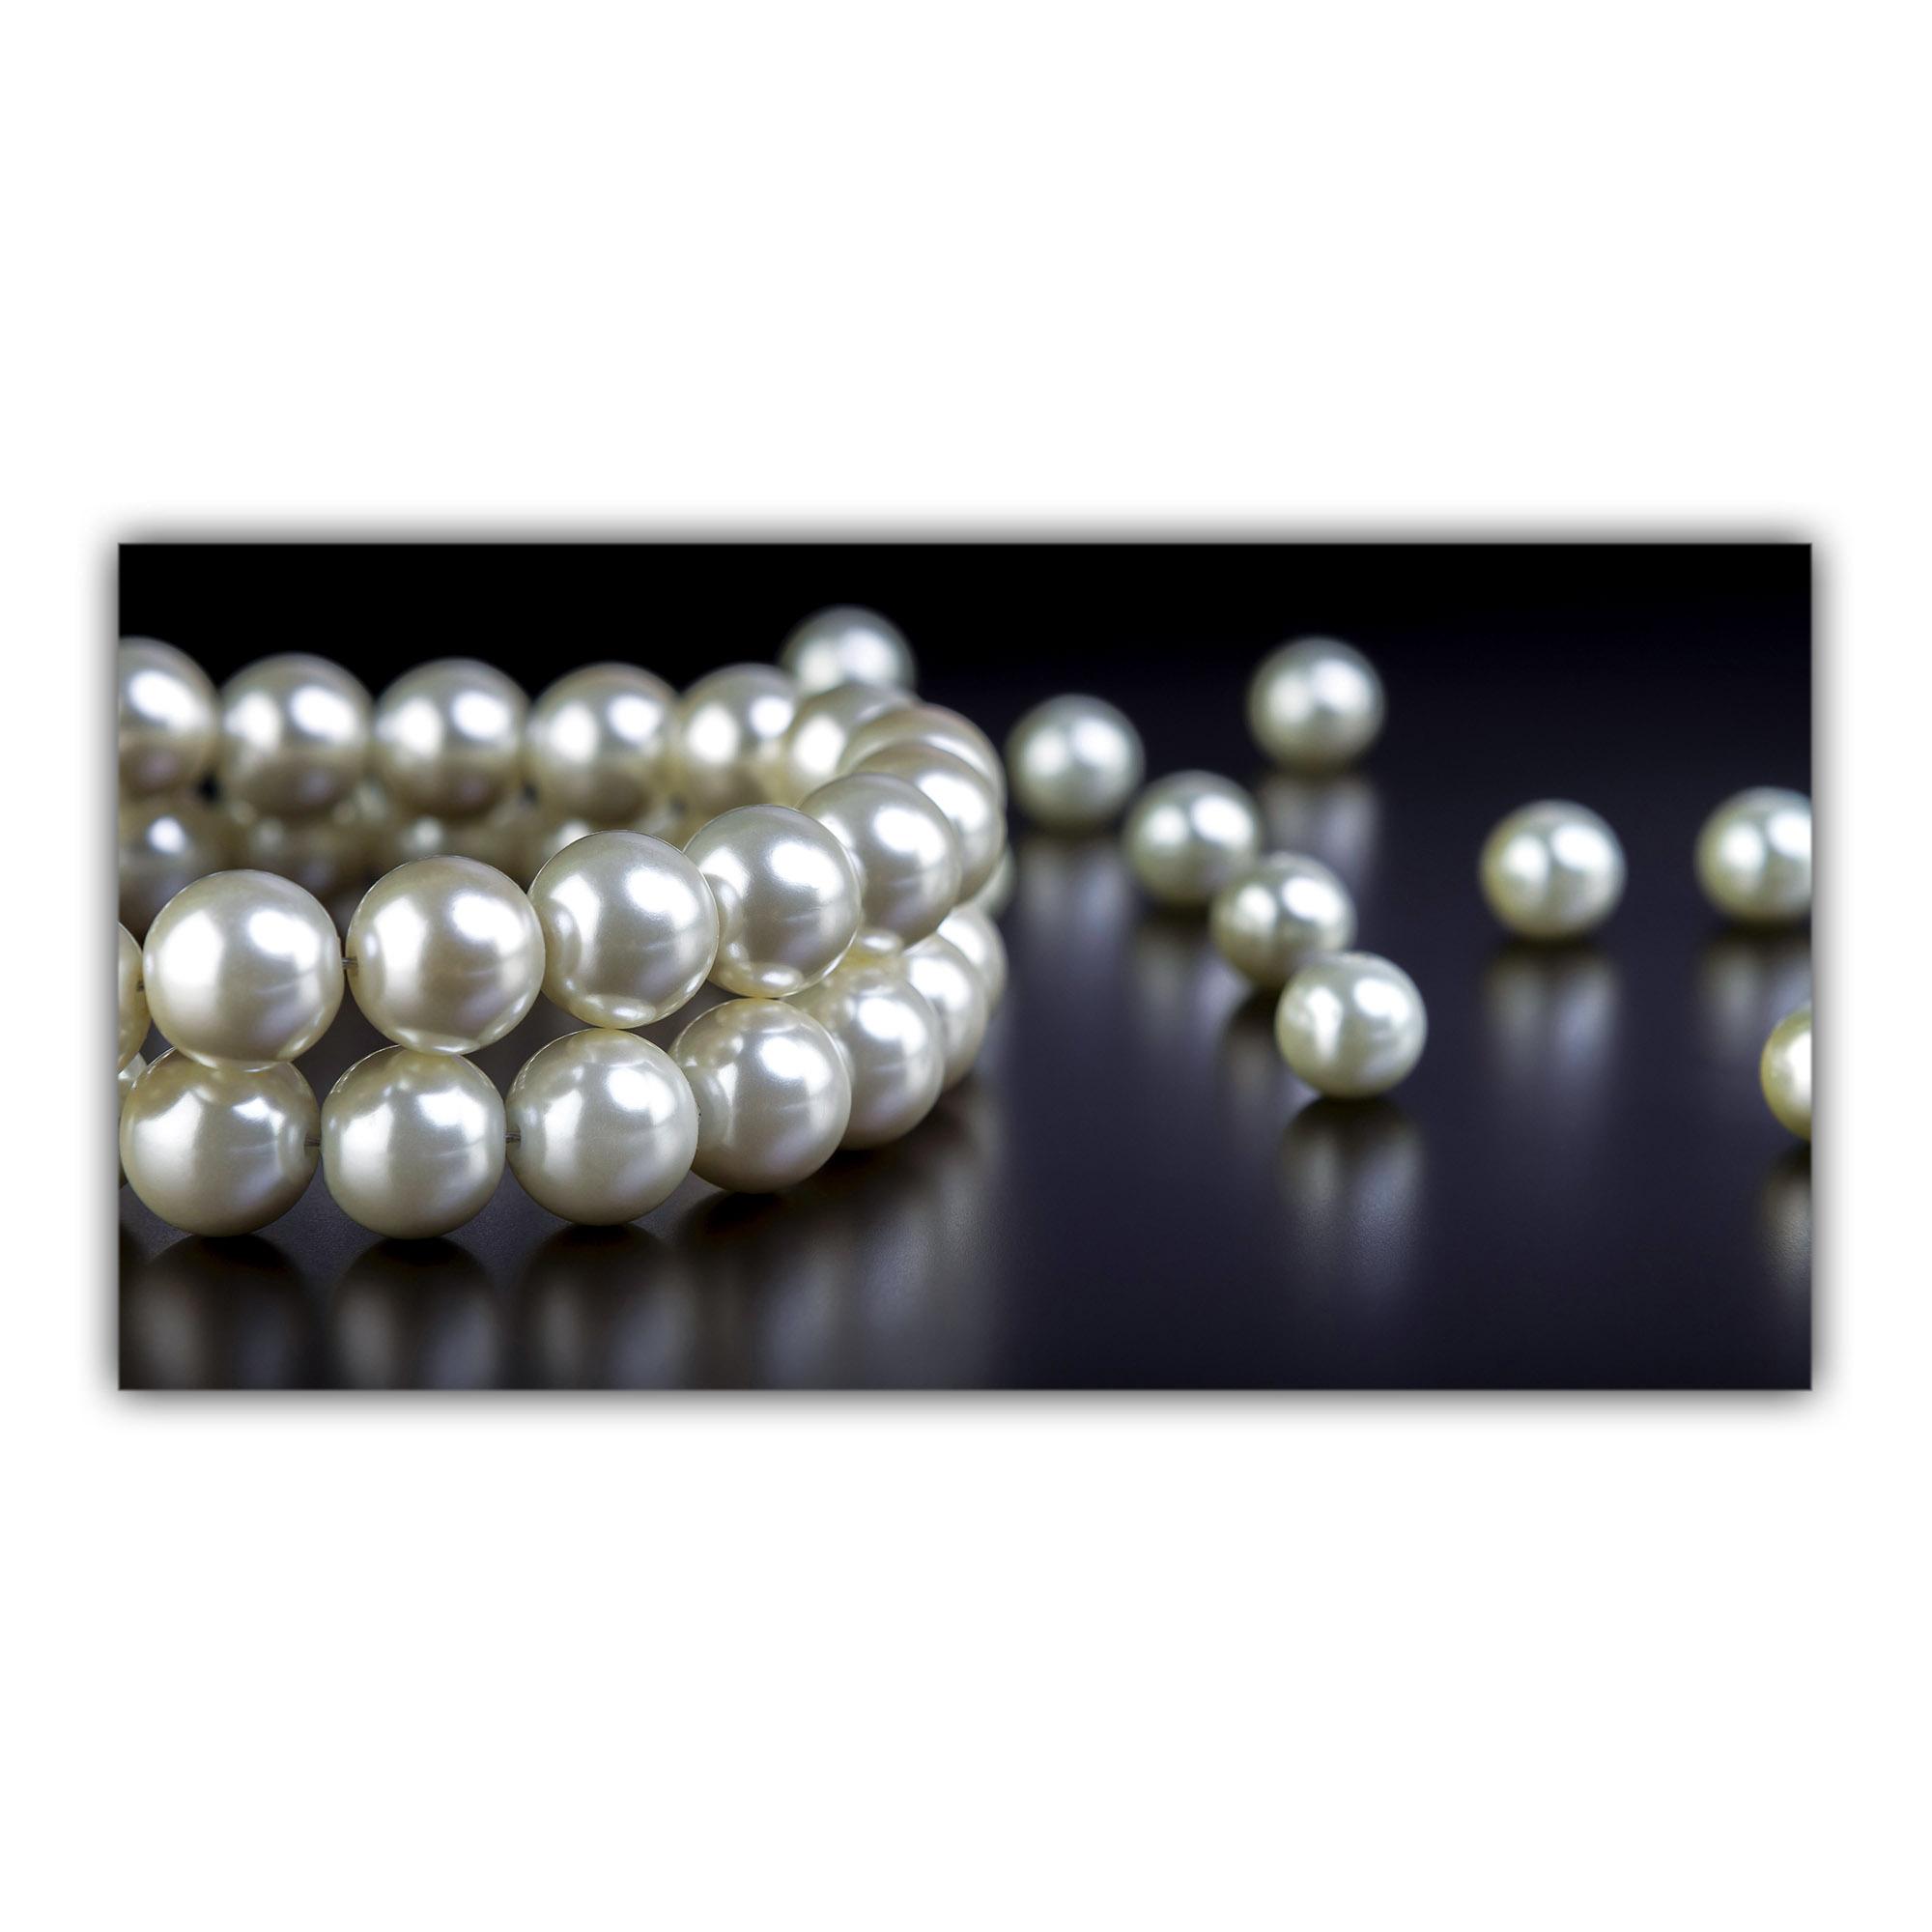 Collier Perles Brillant Bijoux Luxe